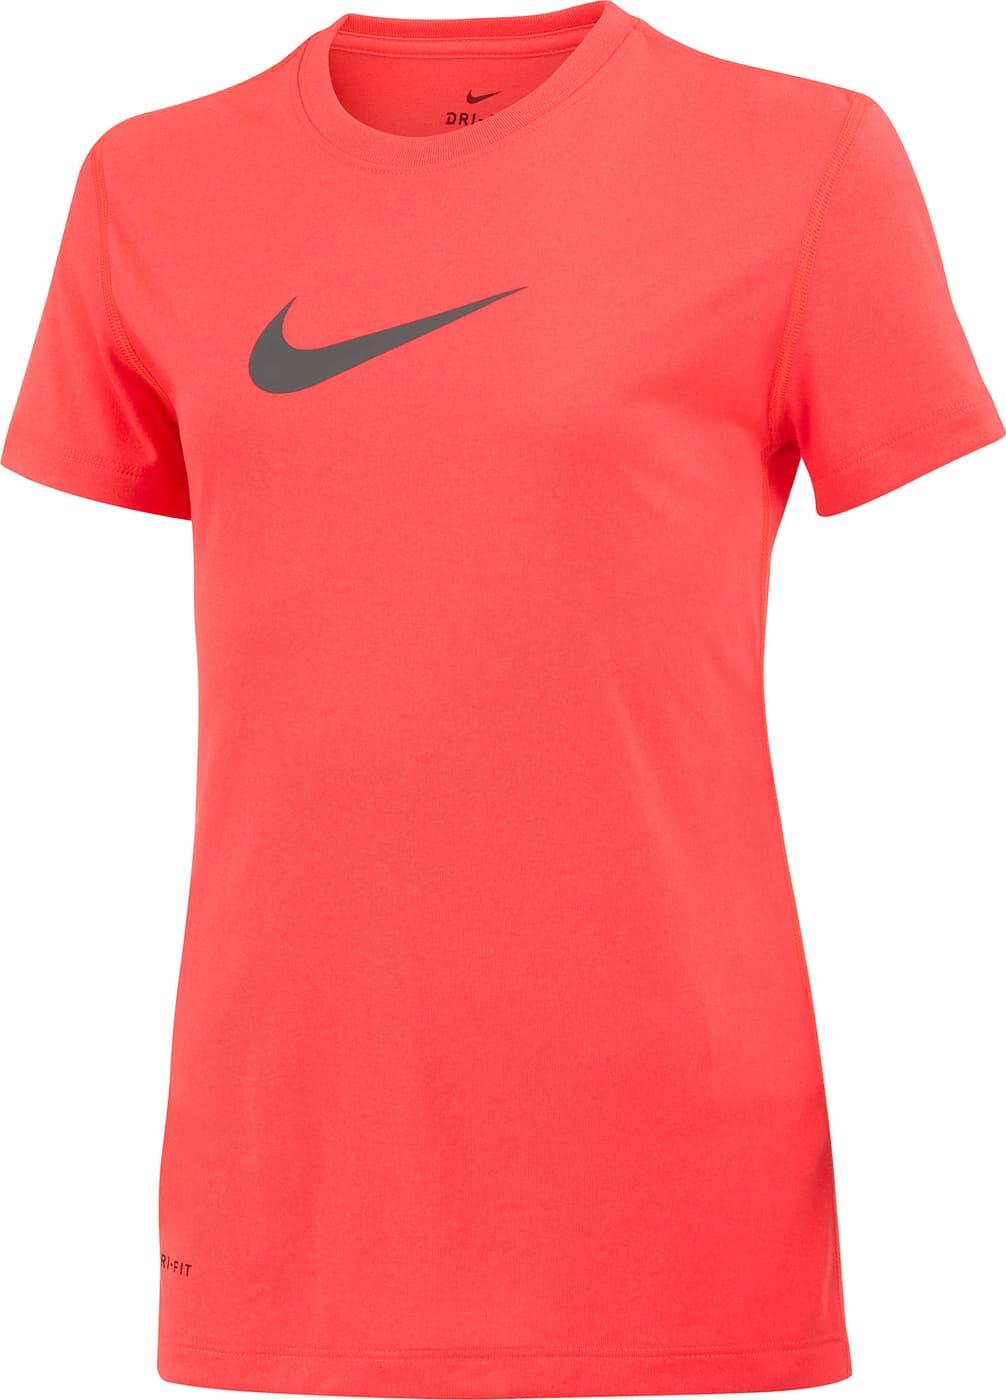 nike t-shirt mädchen 152